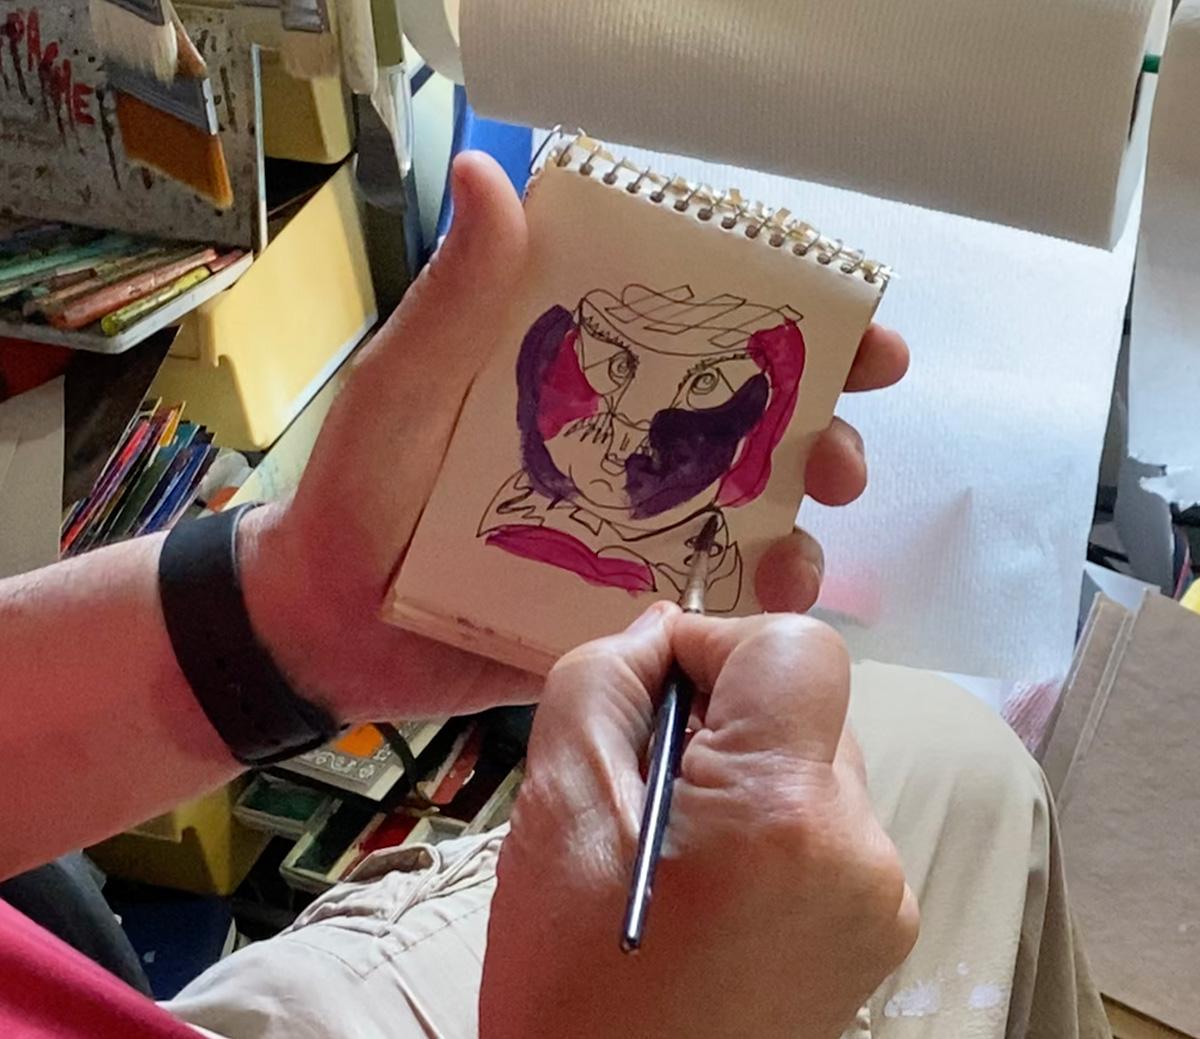 Dick Crispo watercolor and ink color sketch